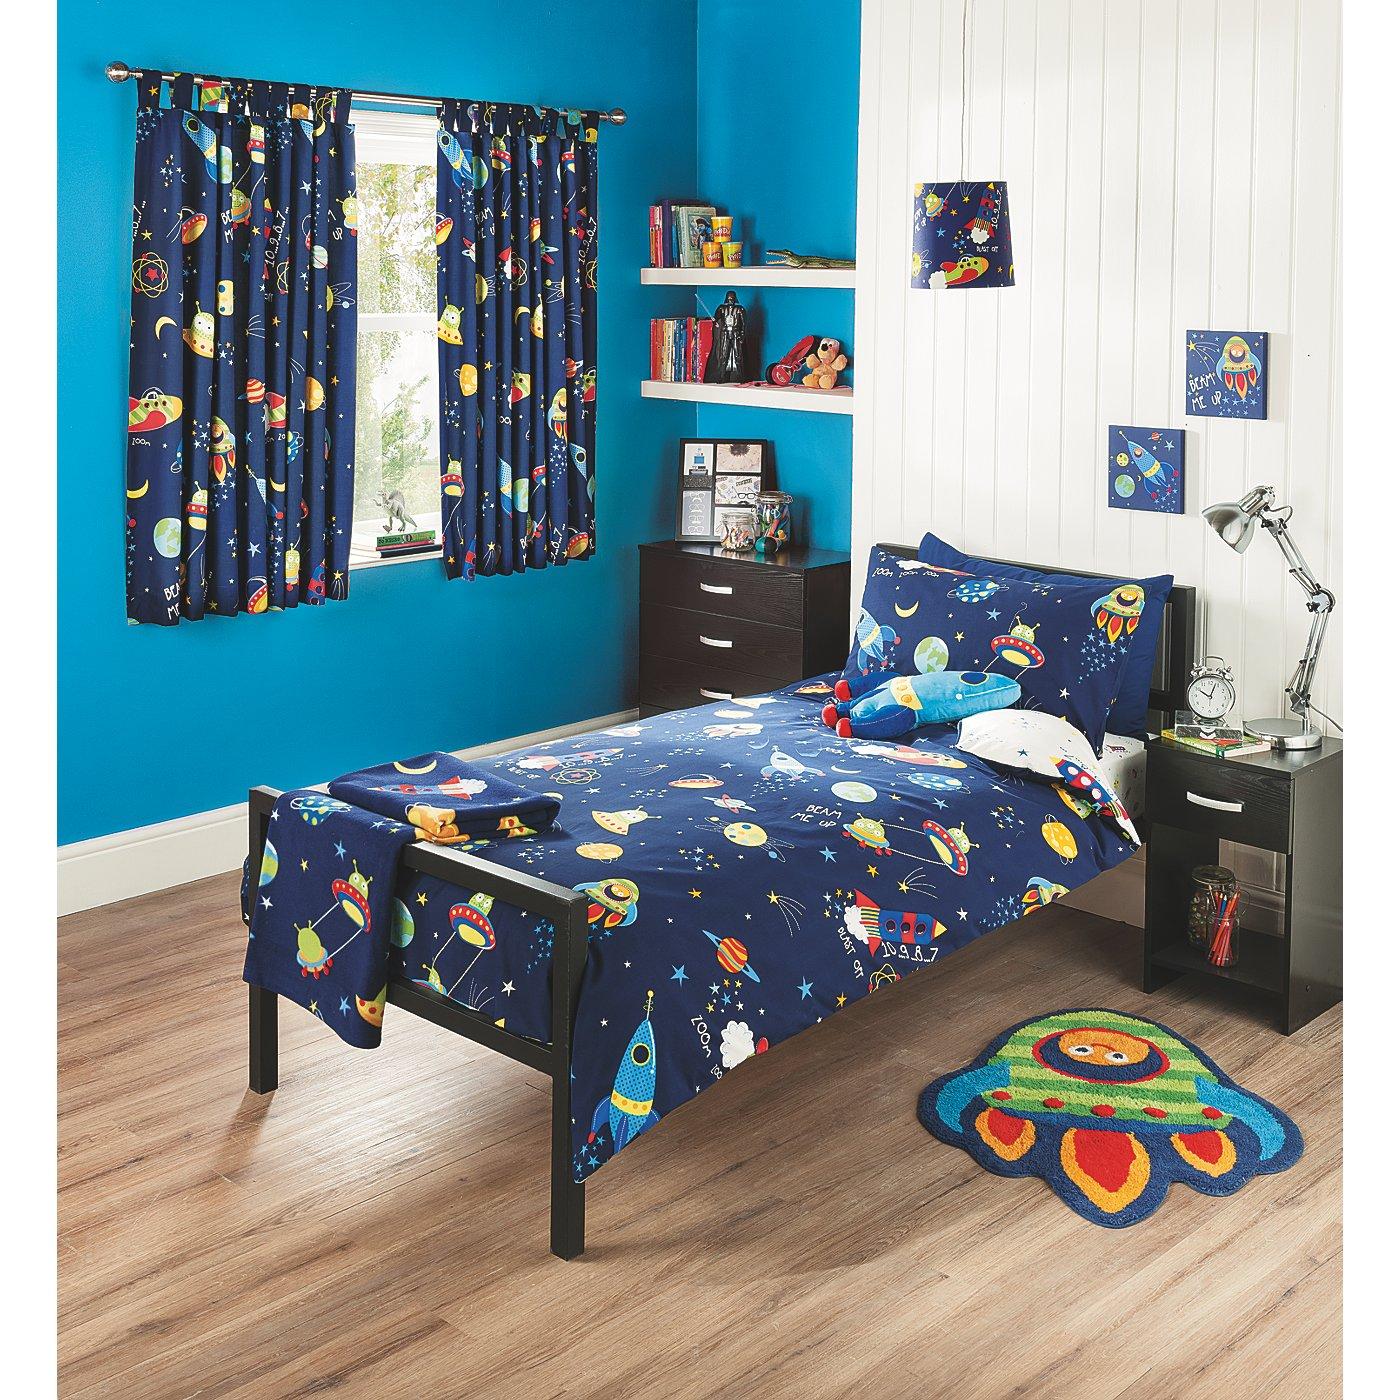 asda kids bedroom | www.stkittsvilla.com